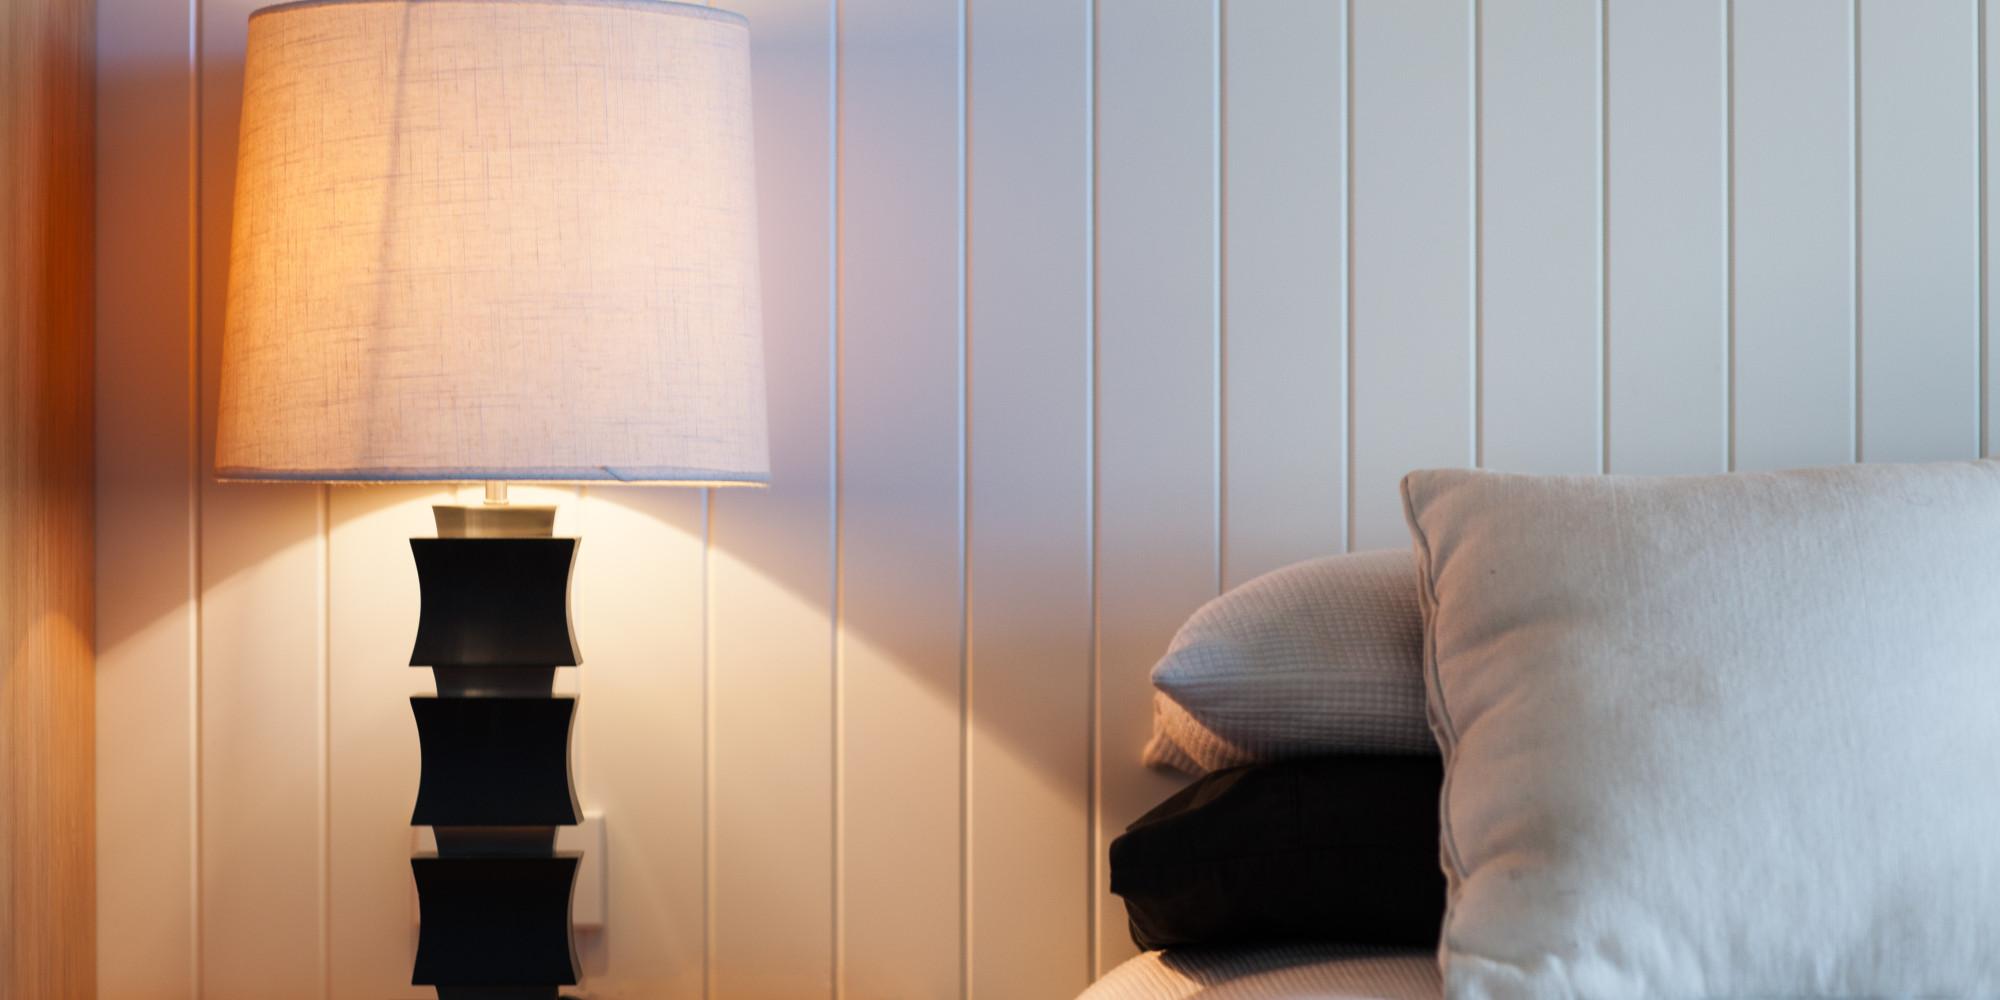 by chandelier ceiling in zapalgo designer metal inspired grido geometric light product black forms shape modern large lighting brutalist lamp